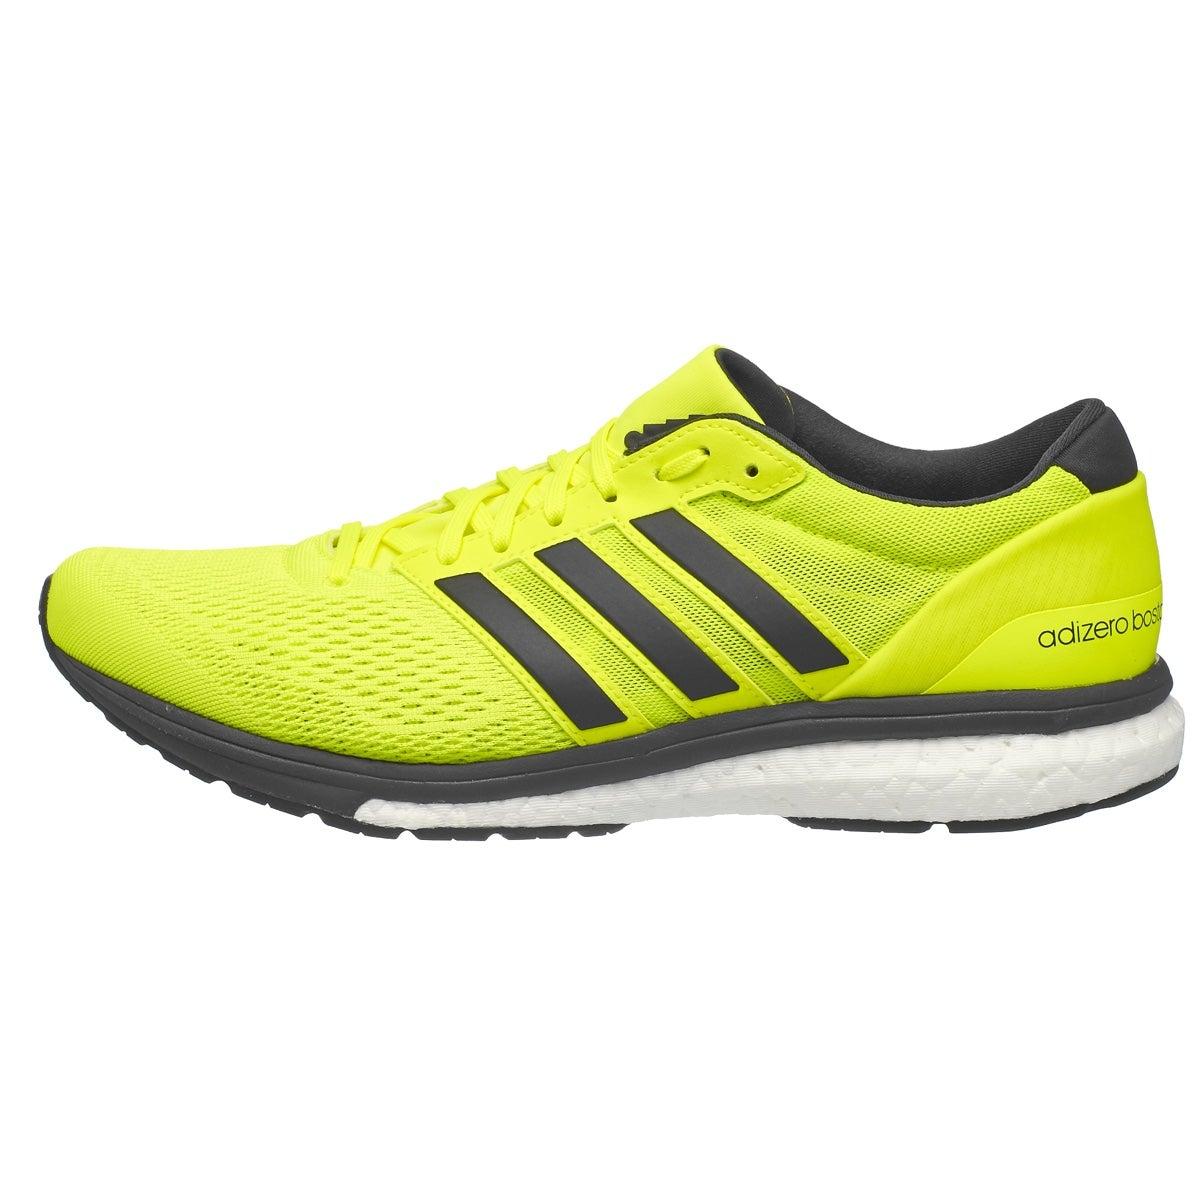 Boston >> adidas adizero Boston 6 Men's Shoes Sun Yellow 360° View | Running Warehouse Europe